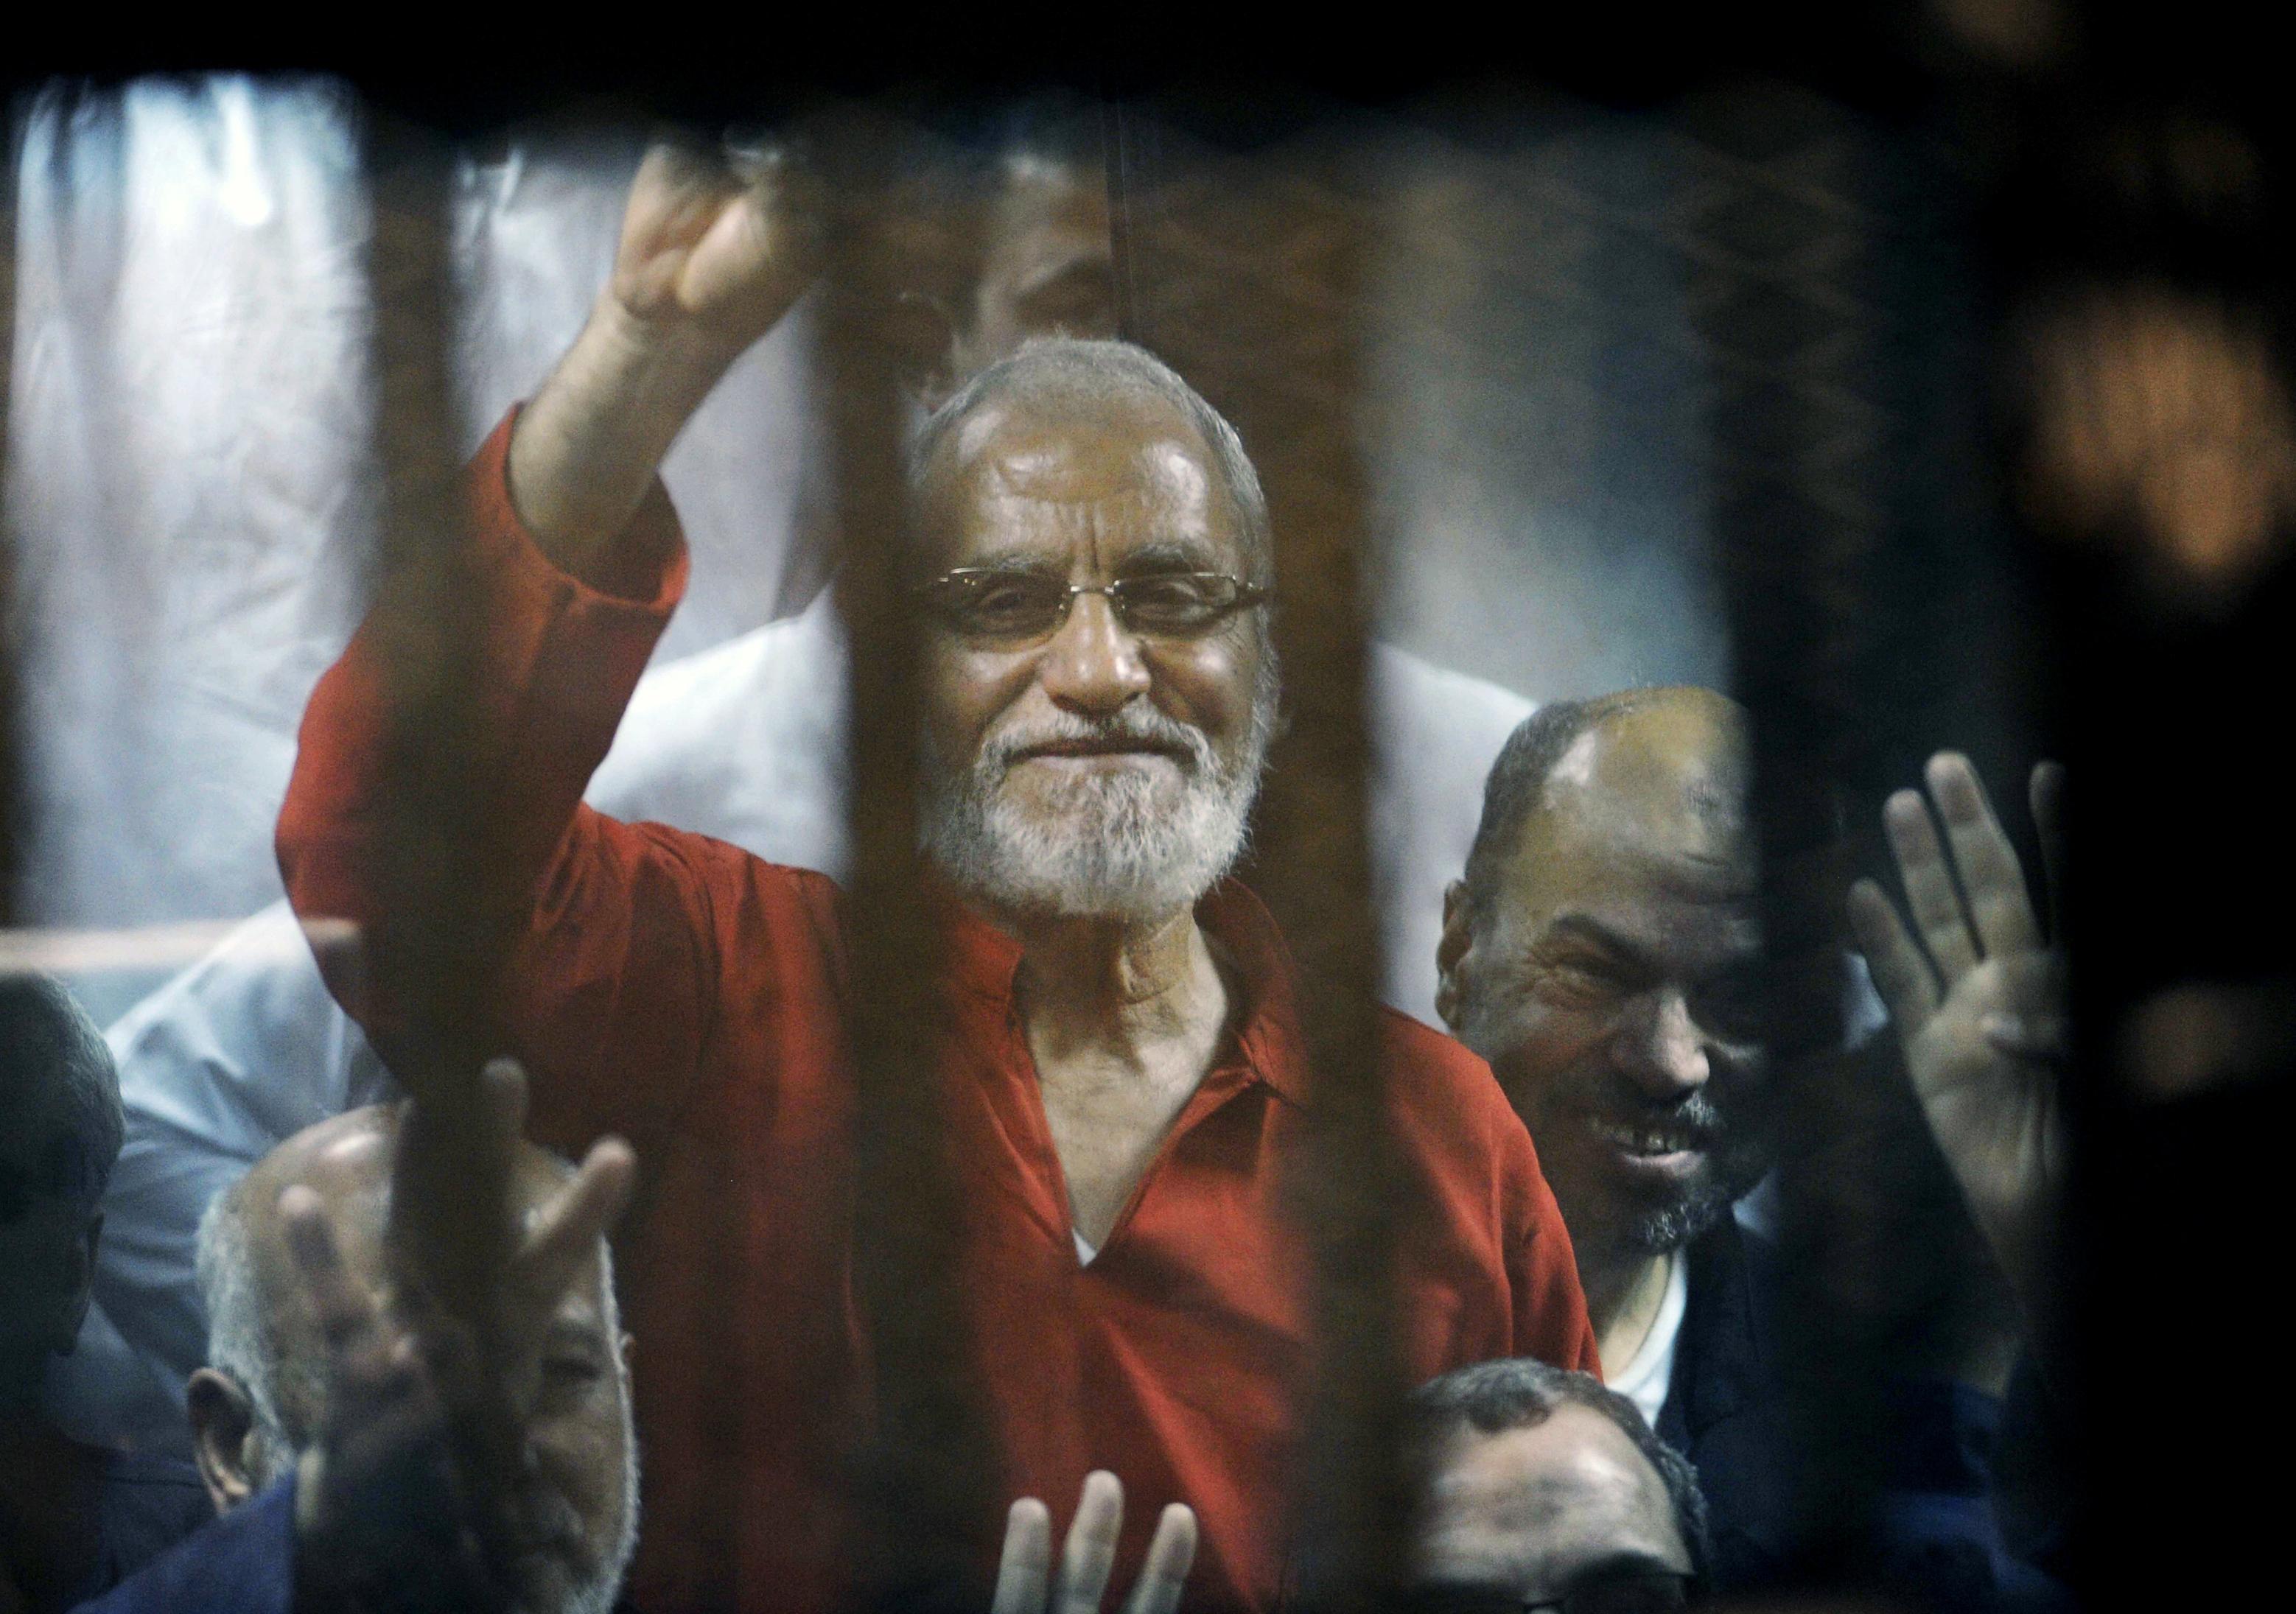 Egypt court sentences 11 Islamists to life for prison breaks